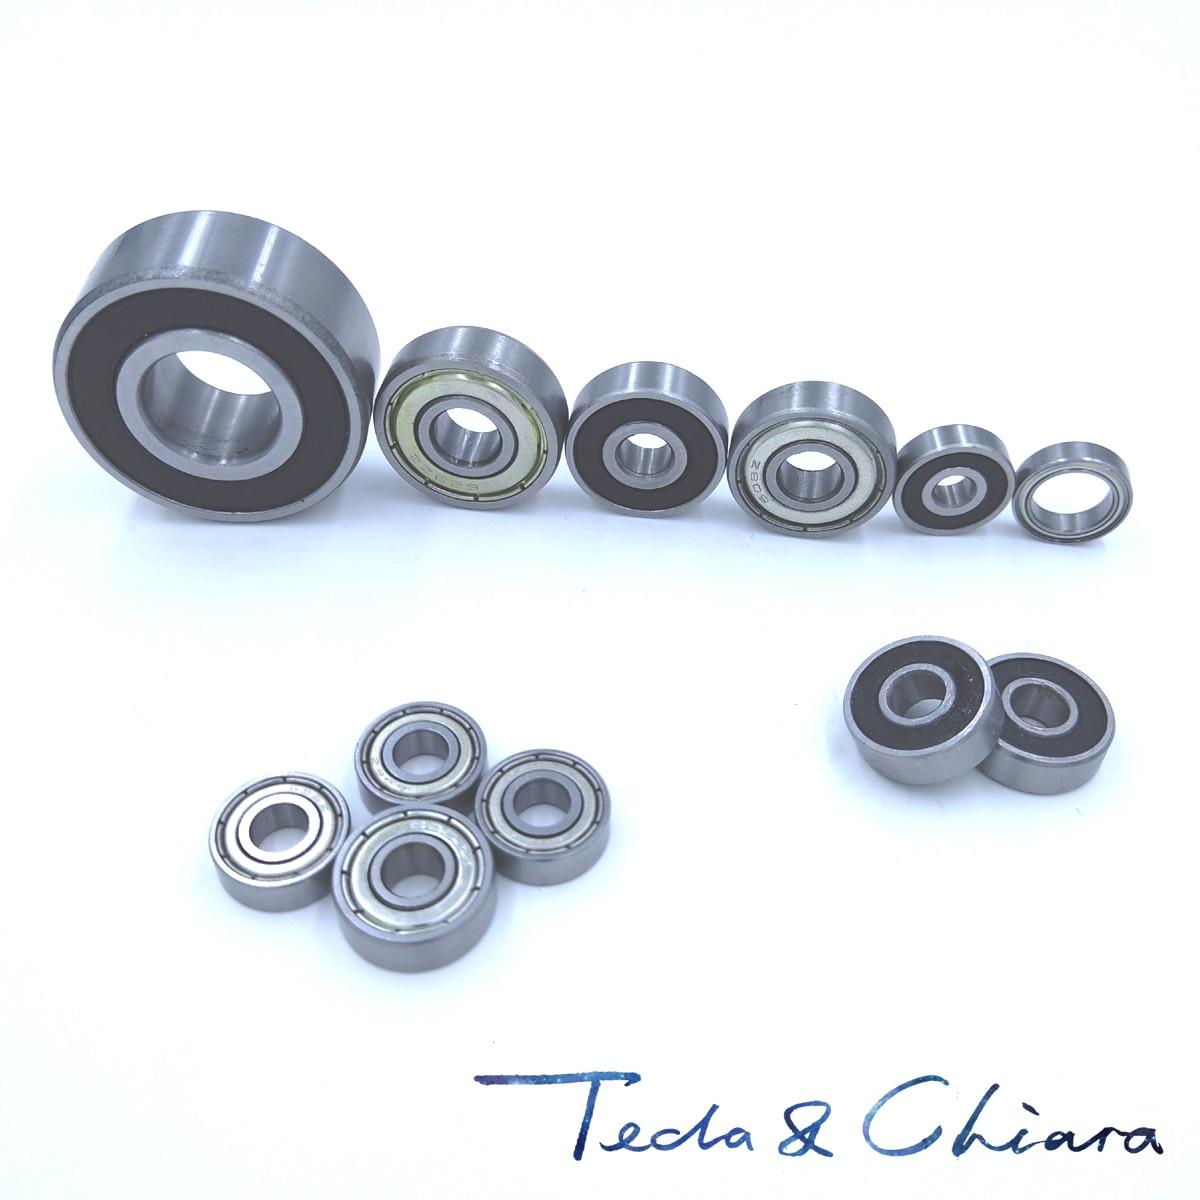 6701 6701ZZ 6701RS 6701-2Z 6701Z 6701-2RS ZZ RS RZ 2RZ Deep Groove Ball Bearings 12 X 18 X 4mm